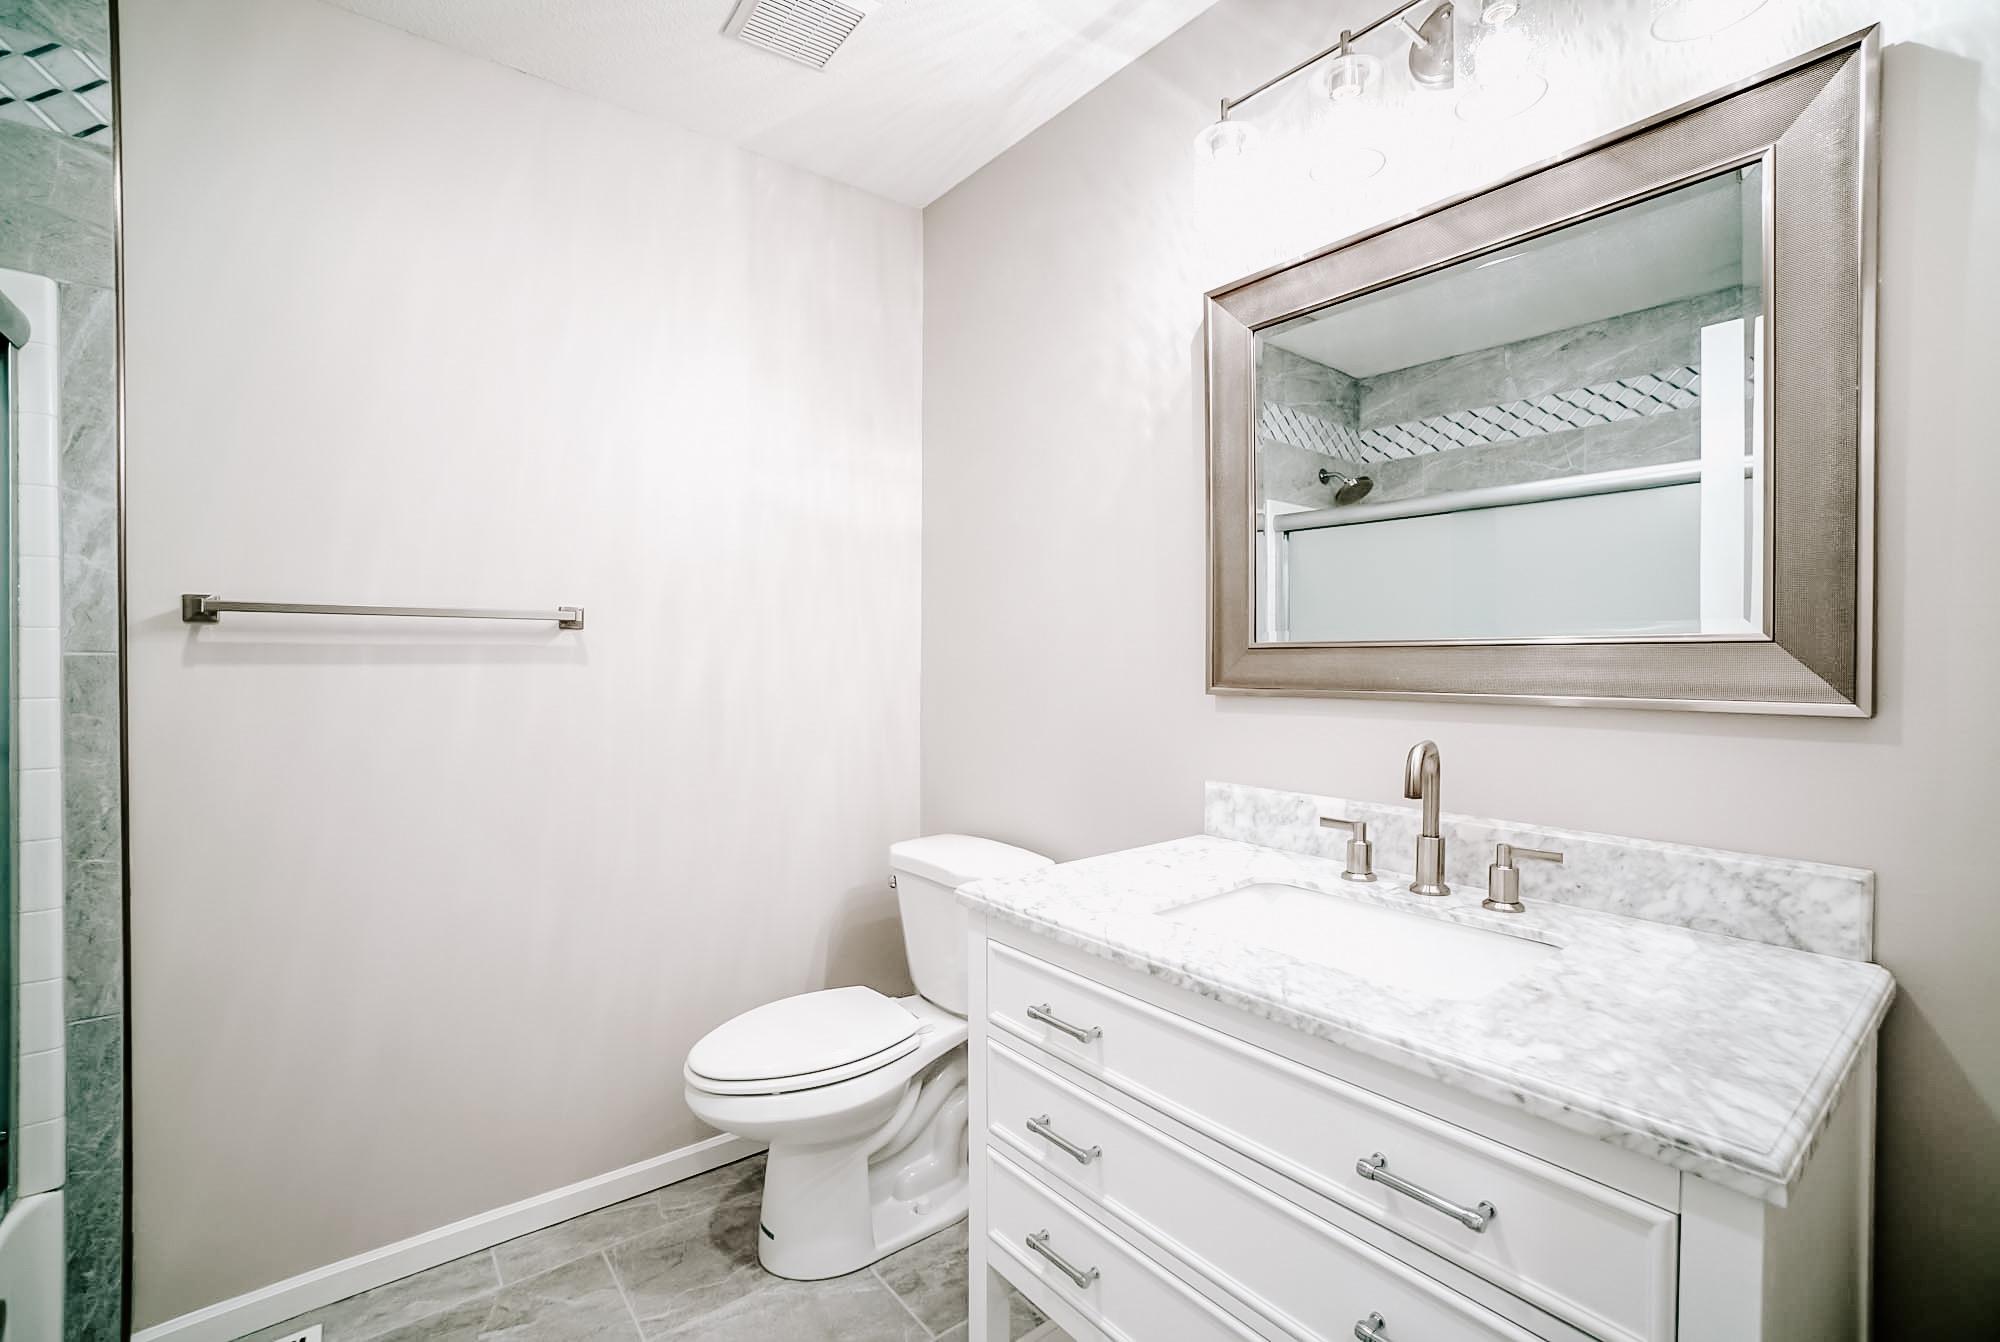 Design Full bath